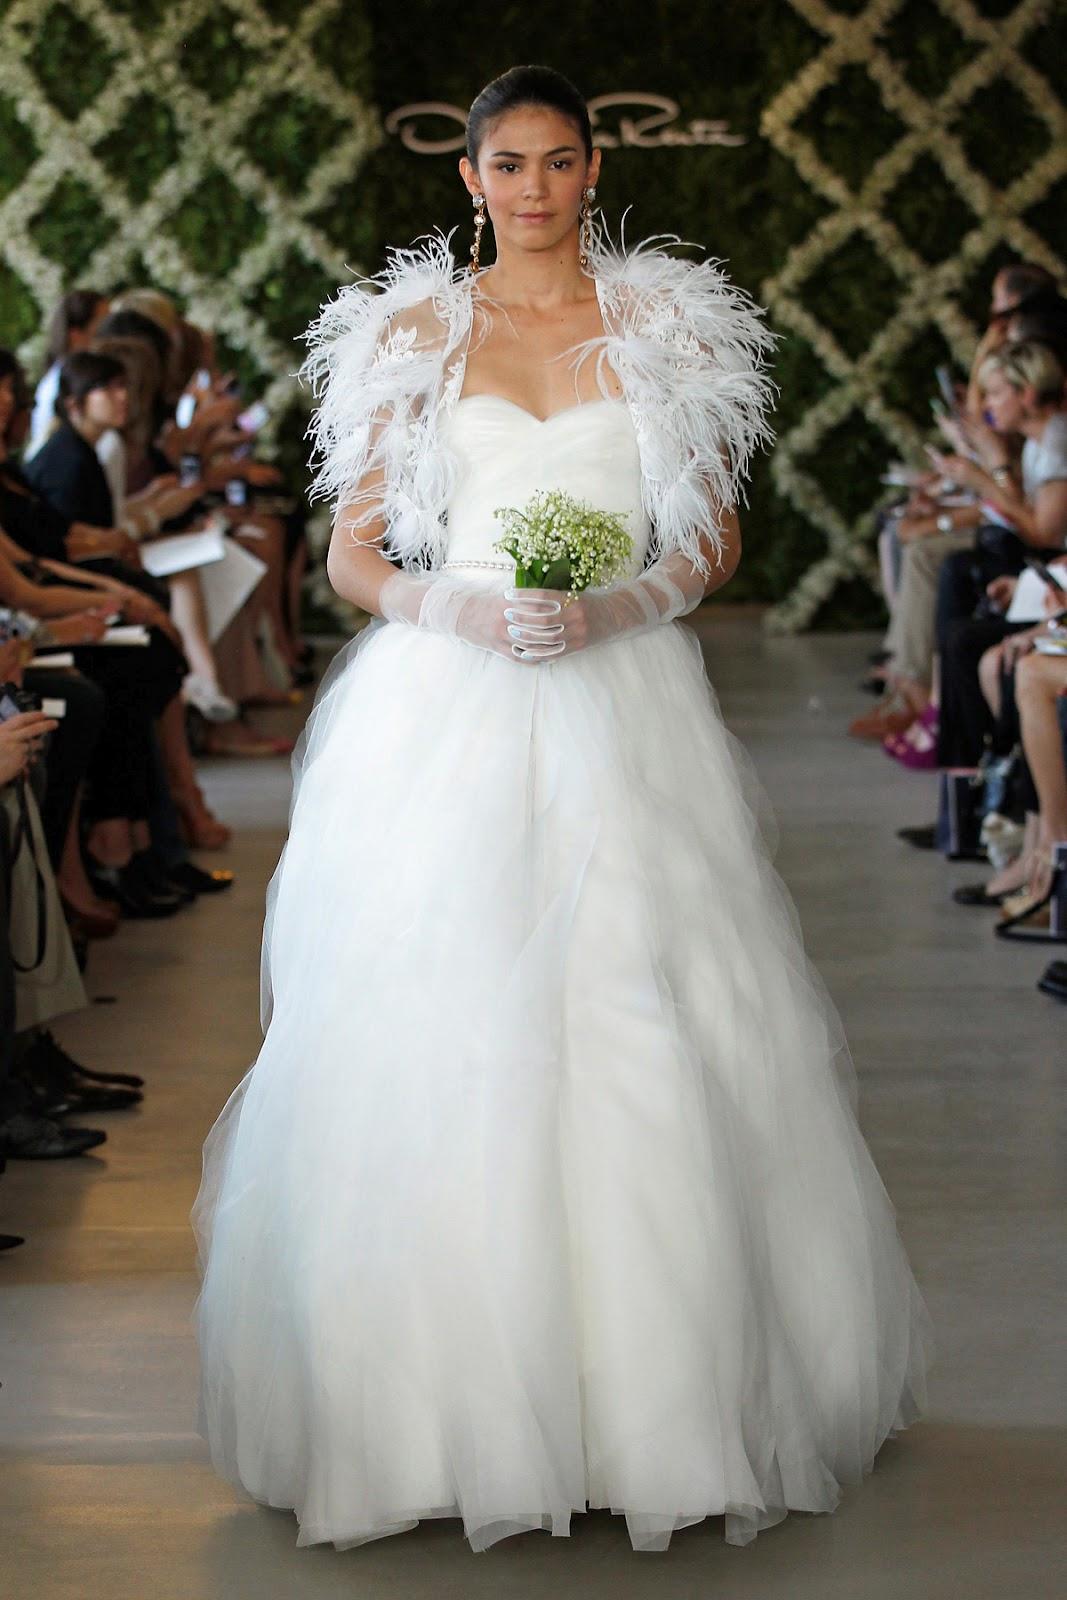 Bridal Dresses UK: Stylish Wedding Dresses By Oscar De La